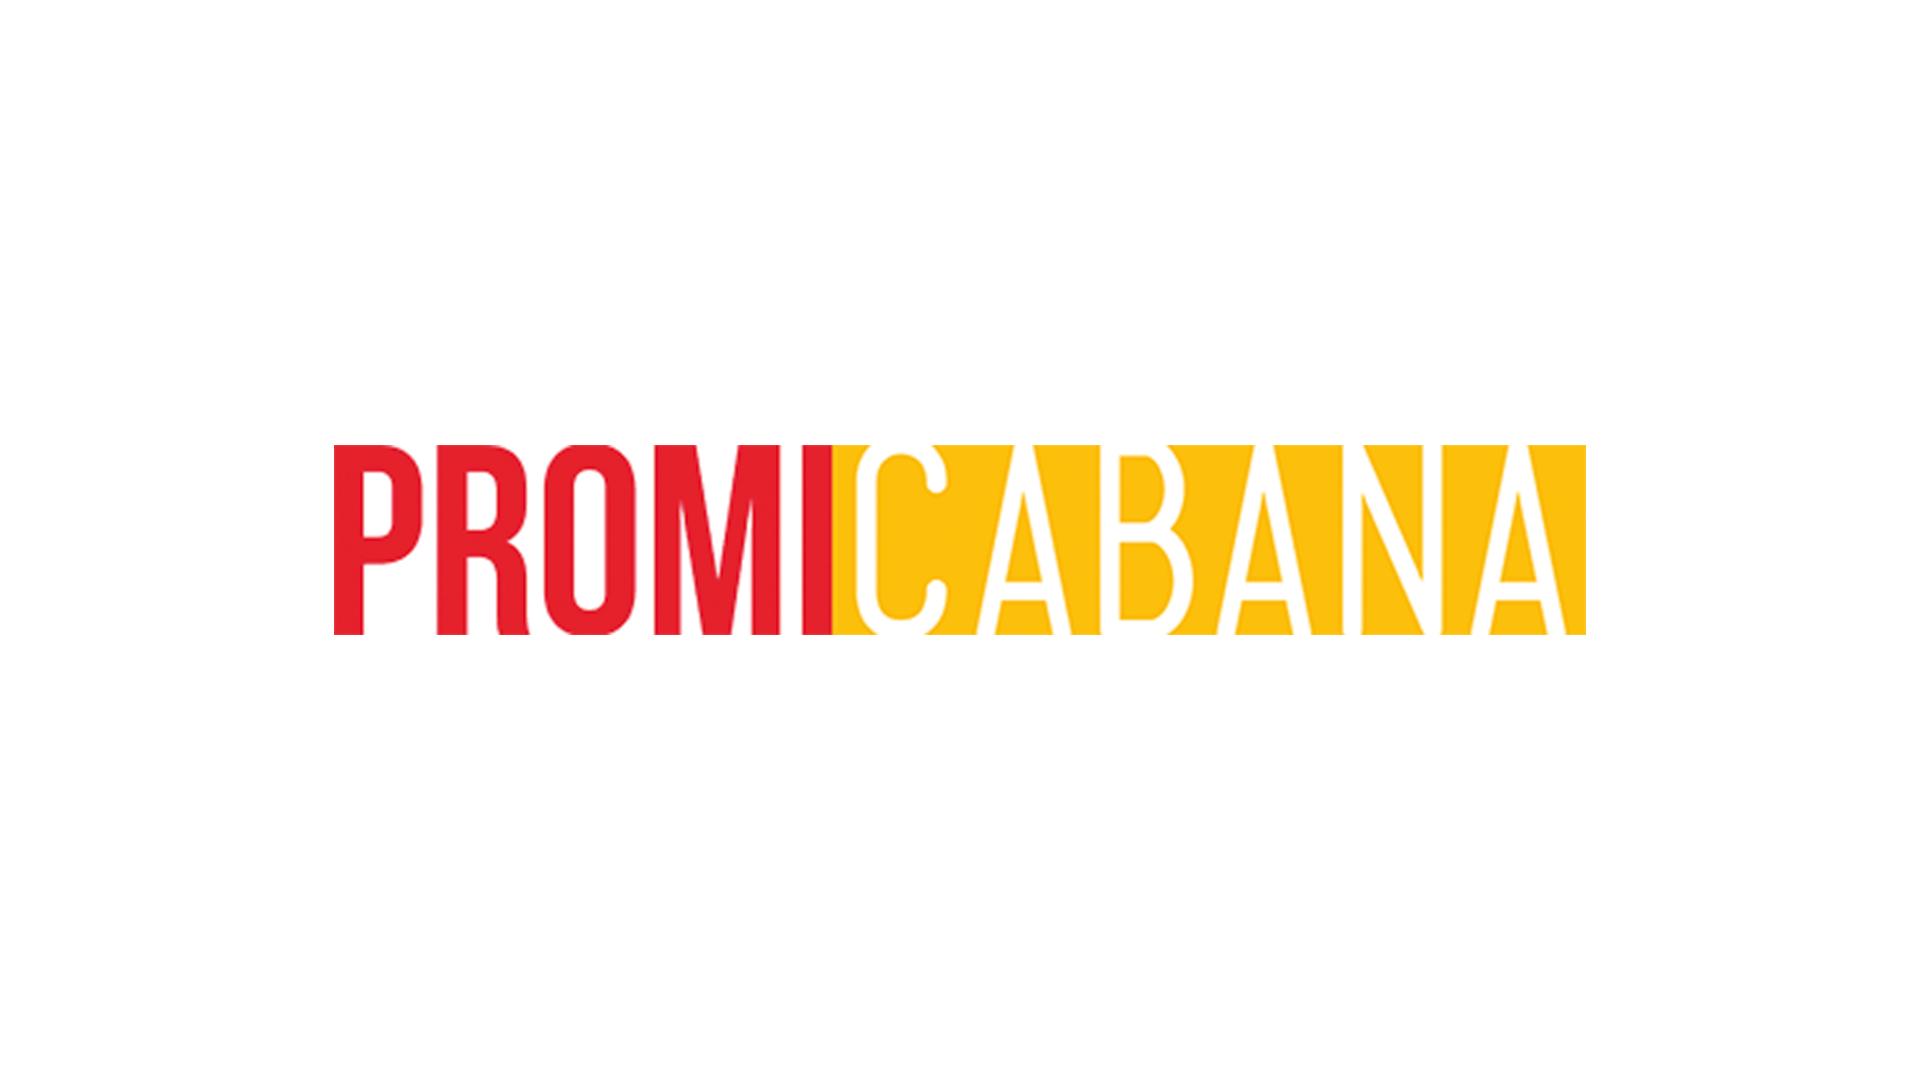 Christian-Bale-Batman-The-Dark-Knight-Rises